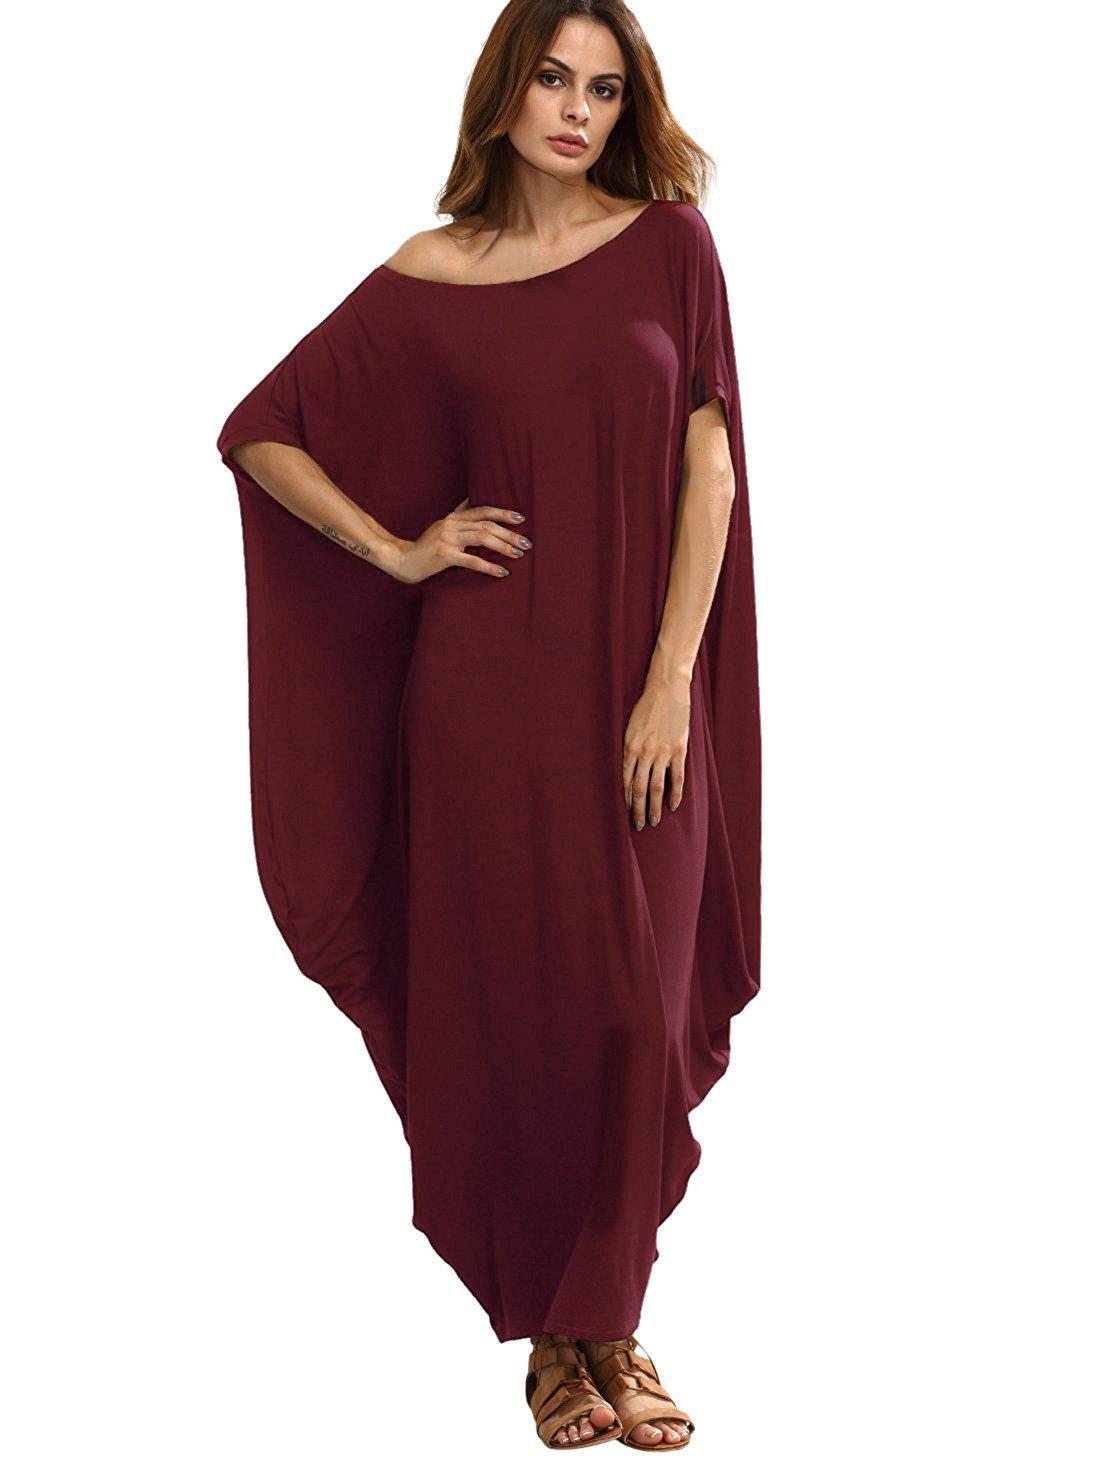 cffe3f296984 Galleon - Verdusa Women s Boho One Off Shoulder Caftan Sleeve Harem Maxi Dress  Burgundy XL